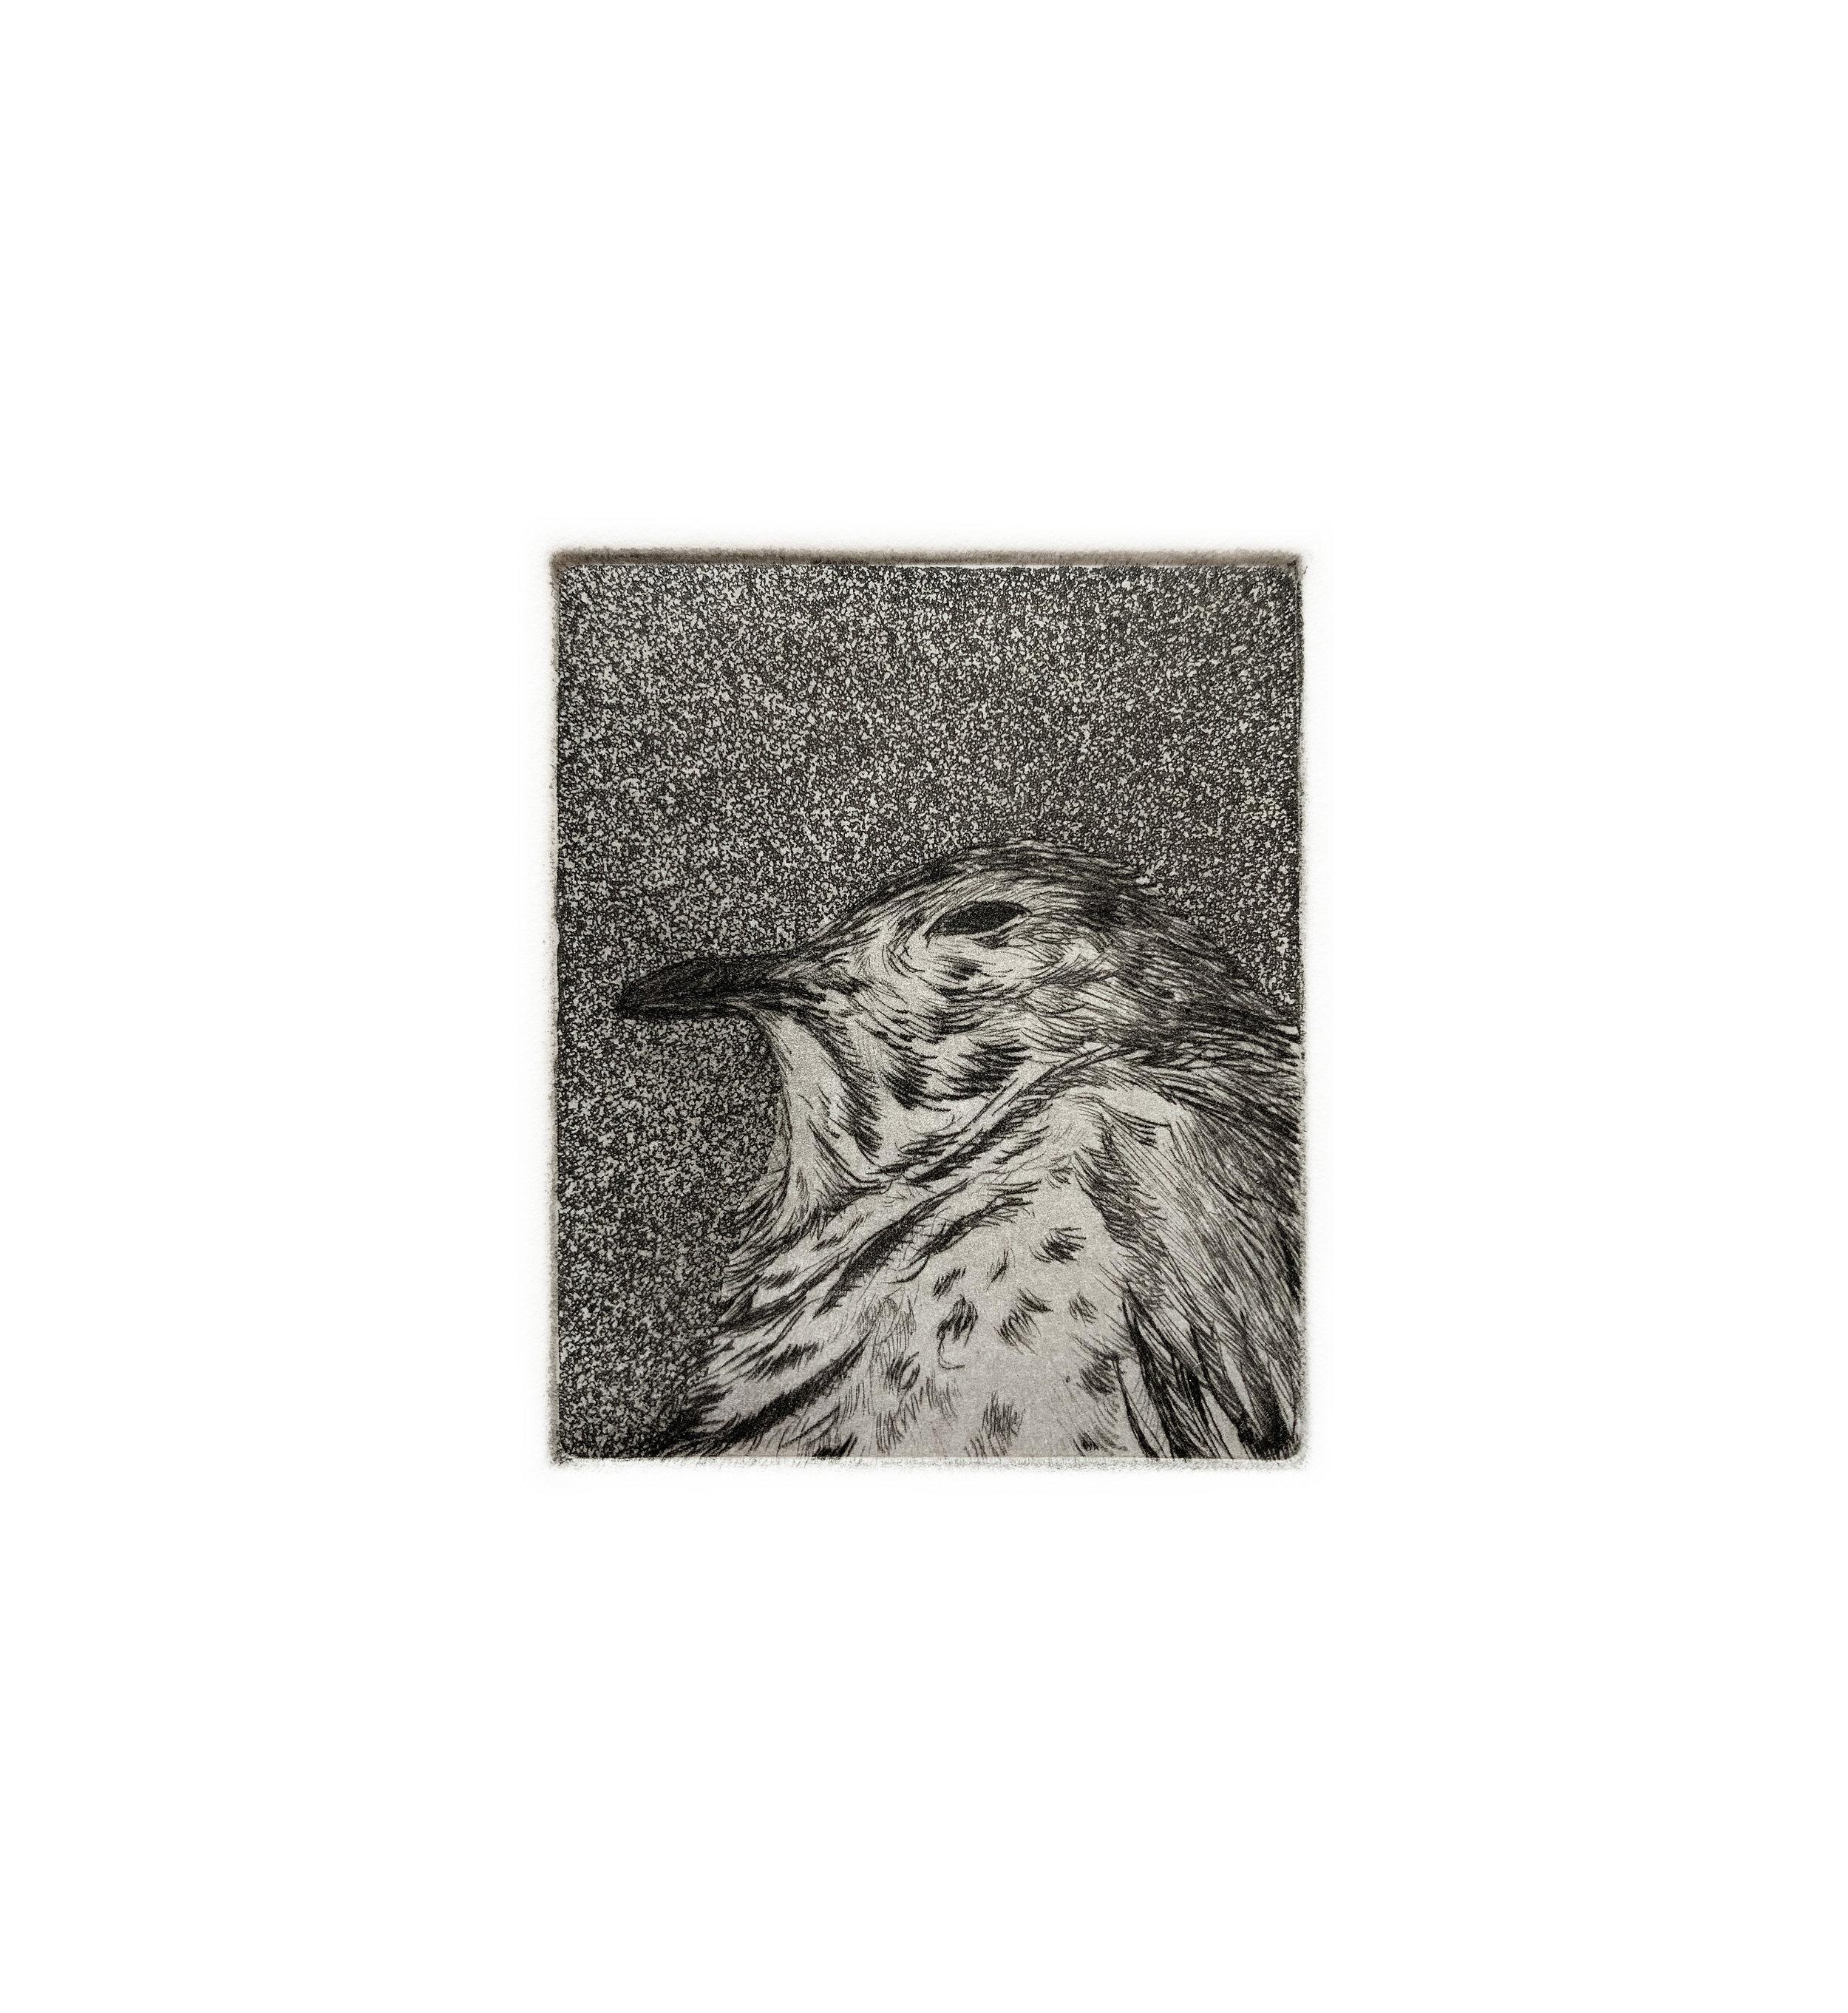 Bird Head #2, 2018